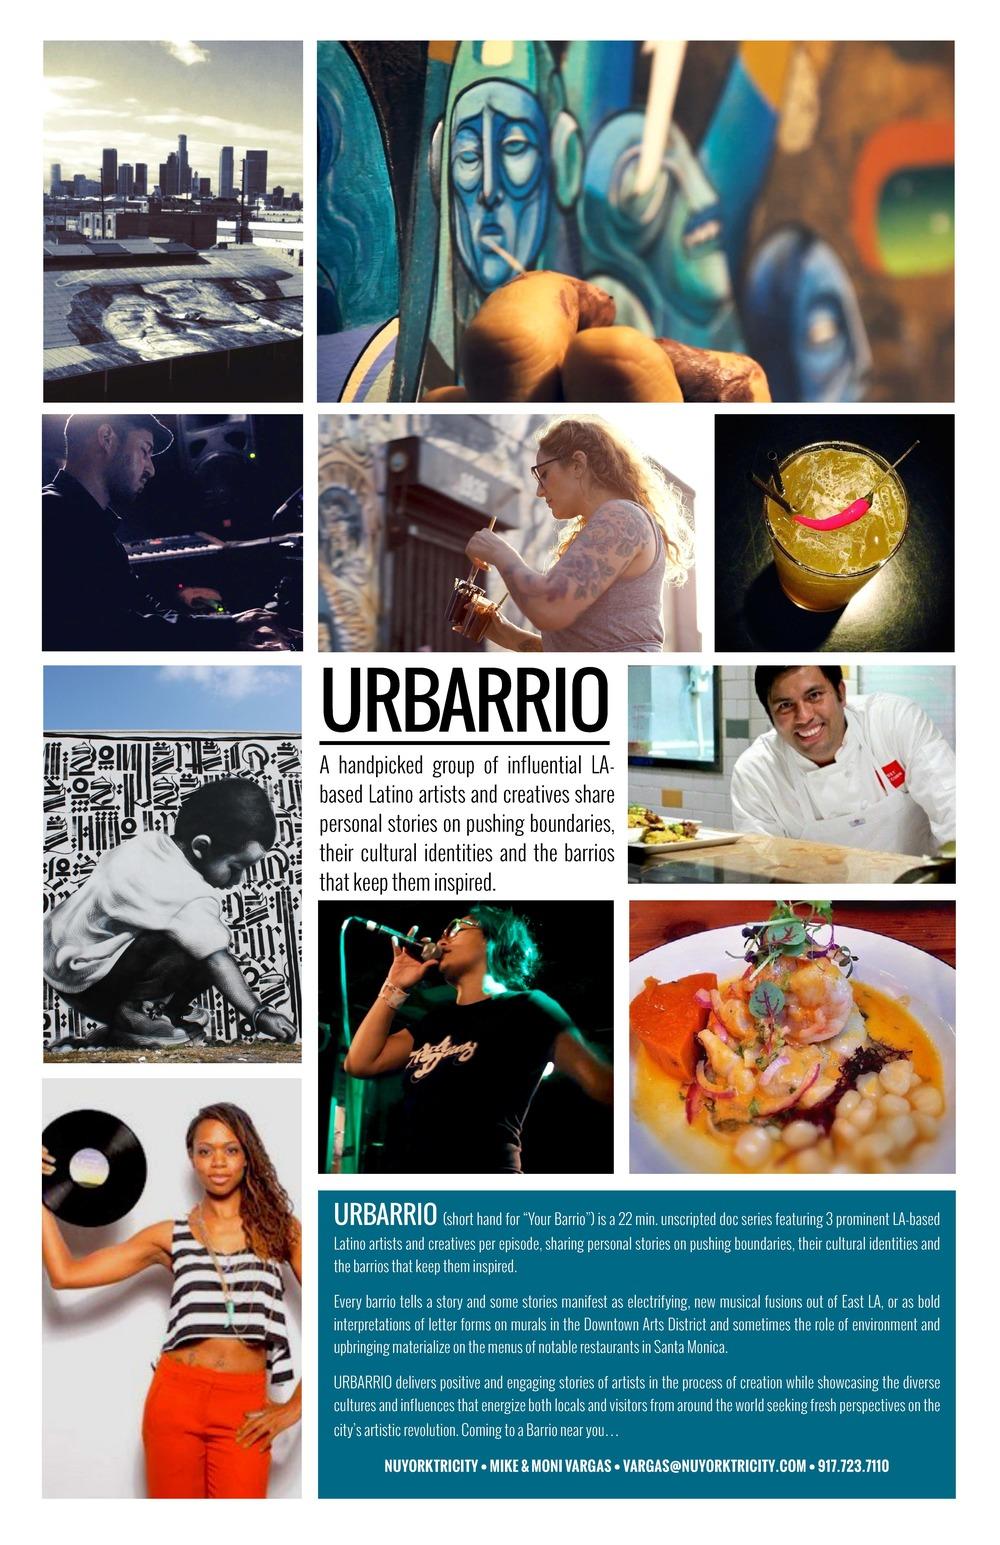 URBARRIO ONE SHEET 22m.jpg